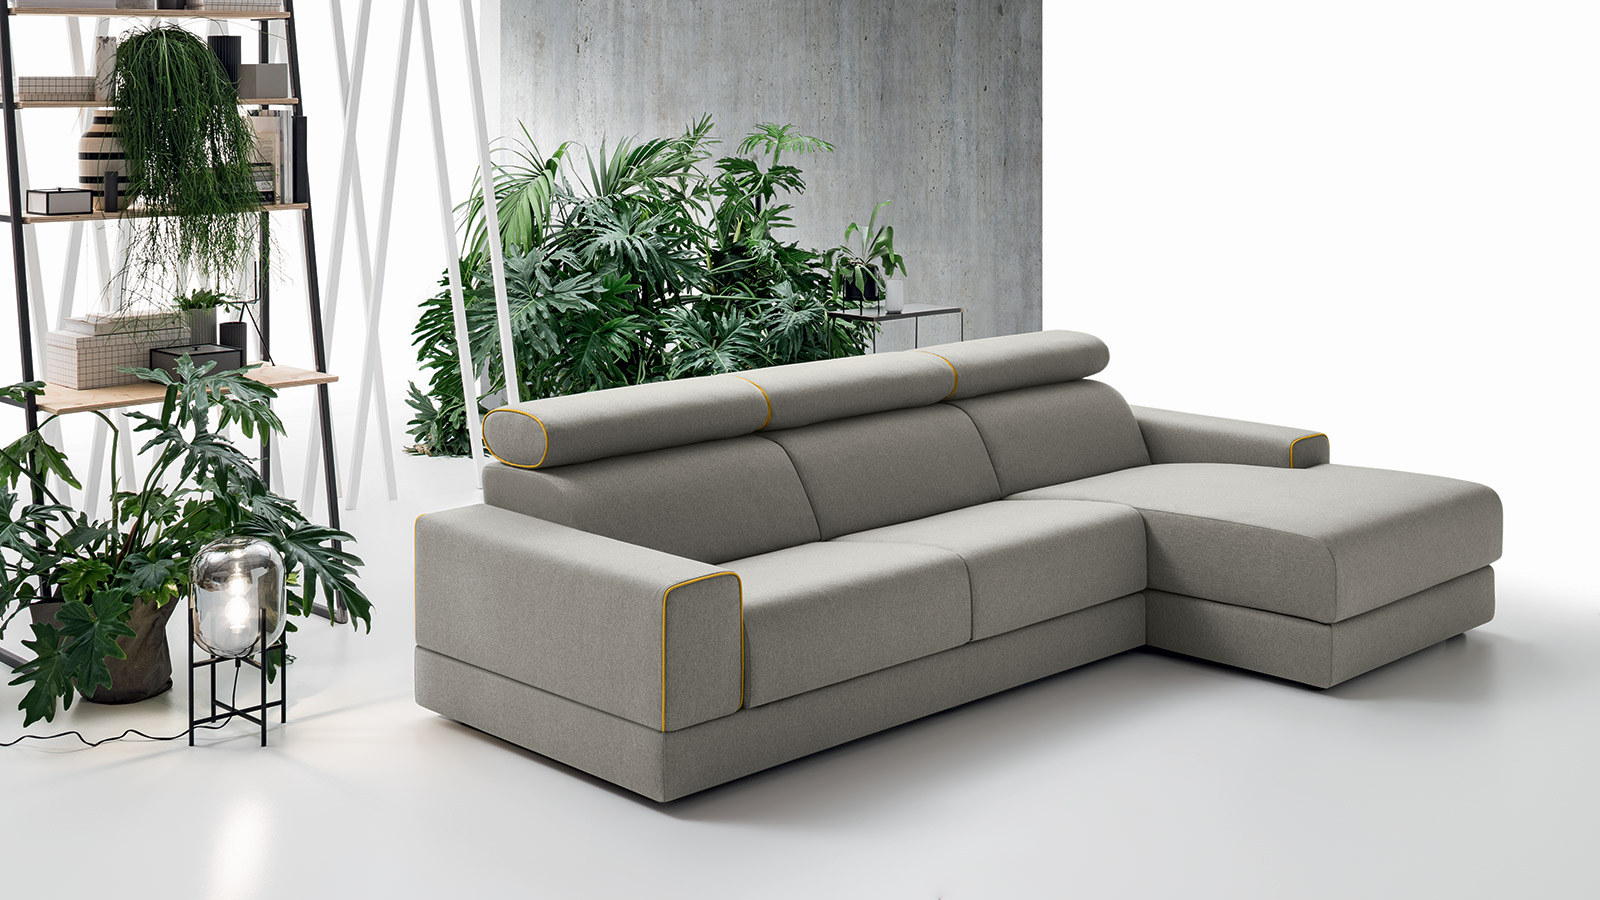 Divani Design.James Divani Moderni E Di Design Felis